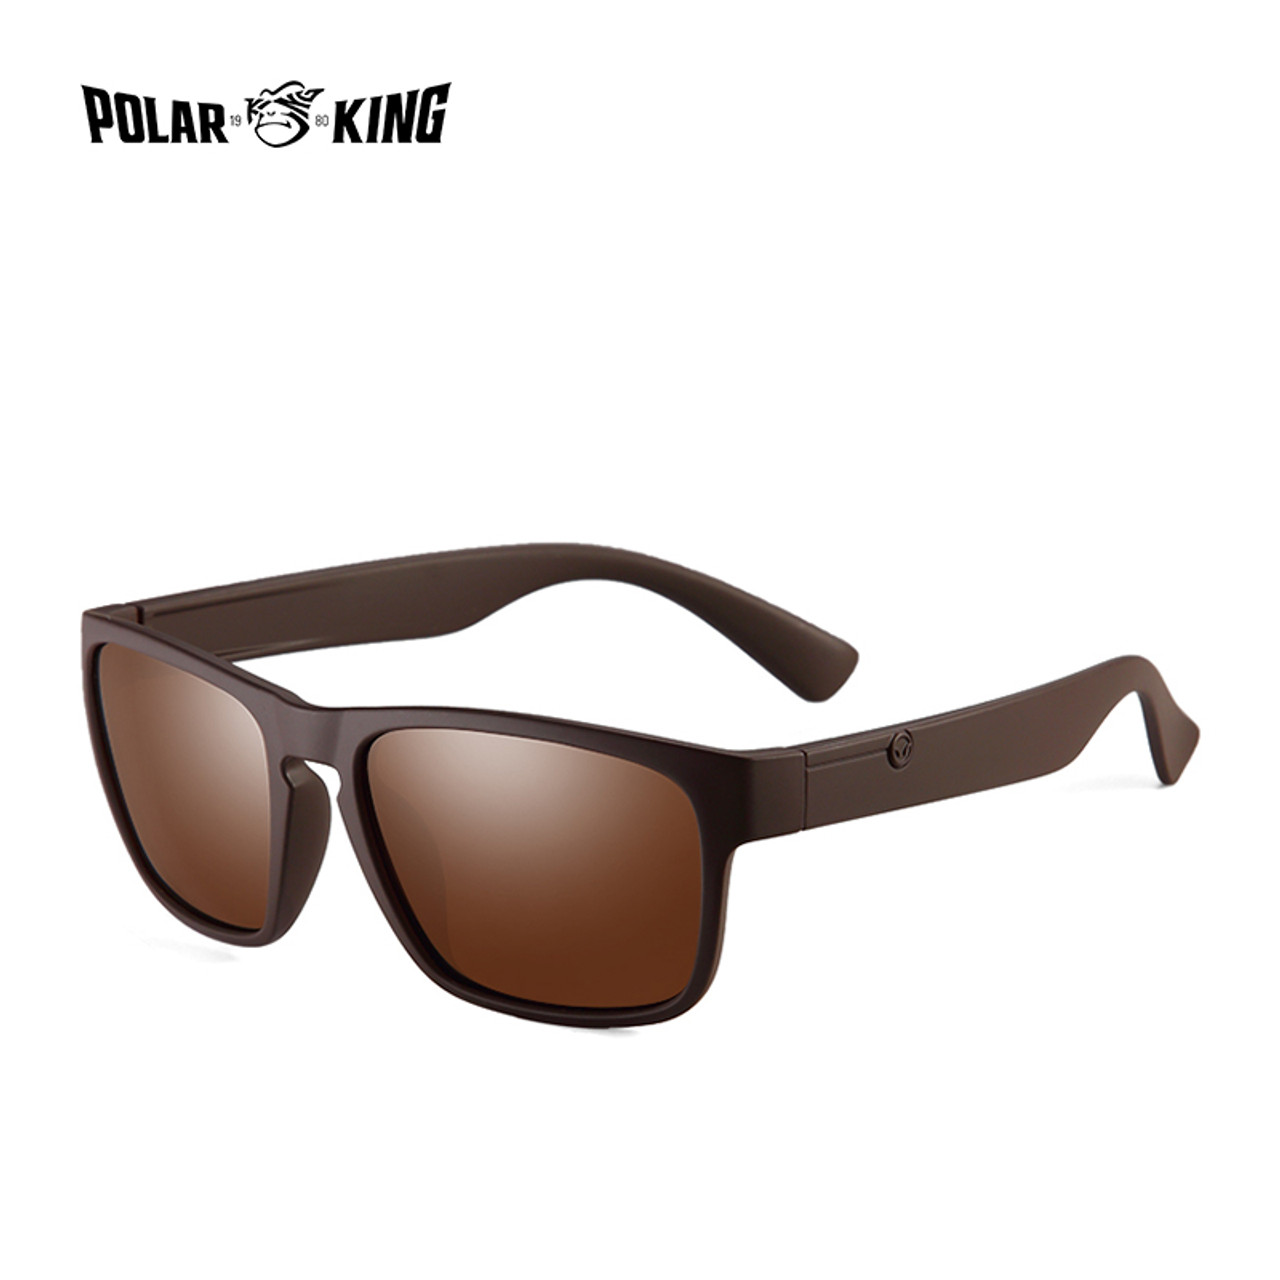 99df8b56ec3 ... POLARKING Brand Polarized Sunglasses For Men Plastic Oculos de sol Men s  Fashion Square Driving Eyewear Travel ...